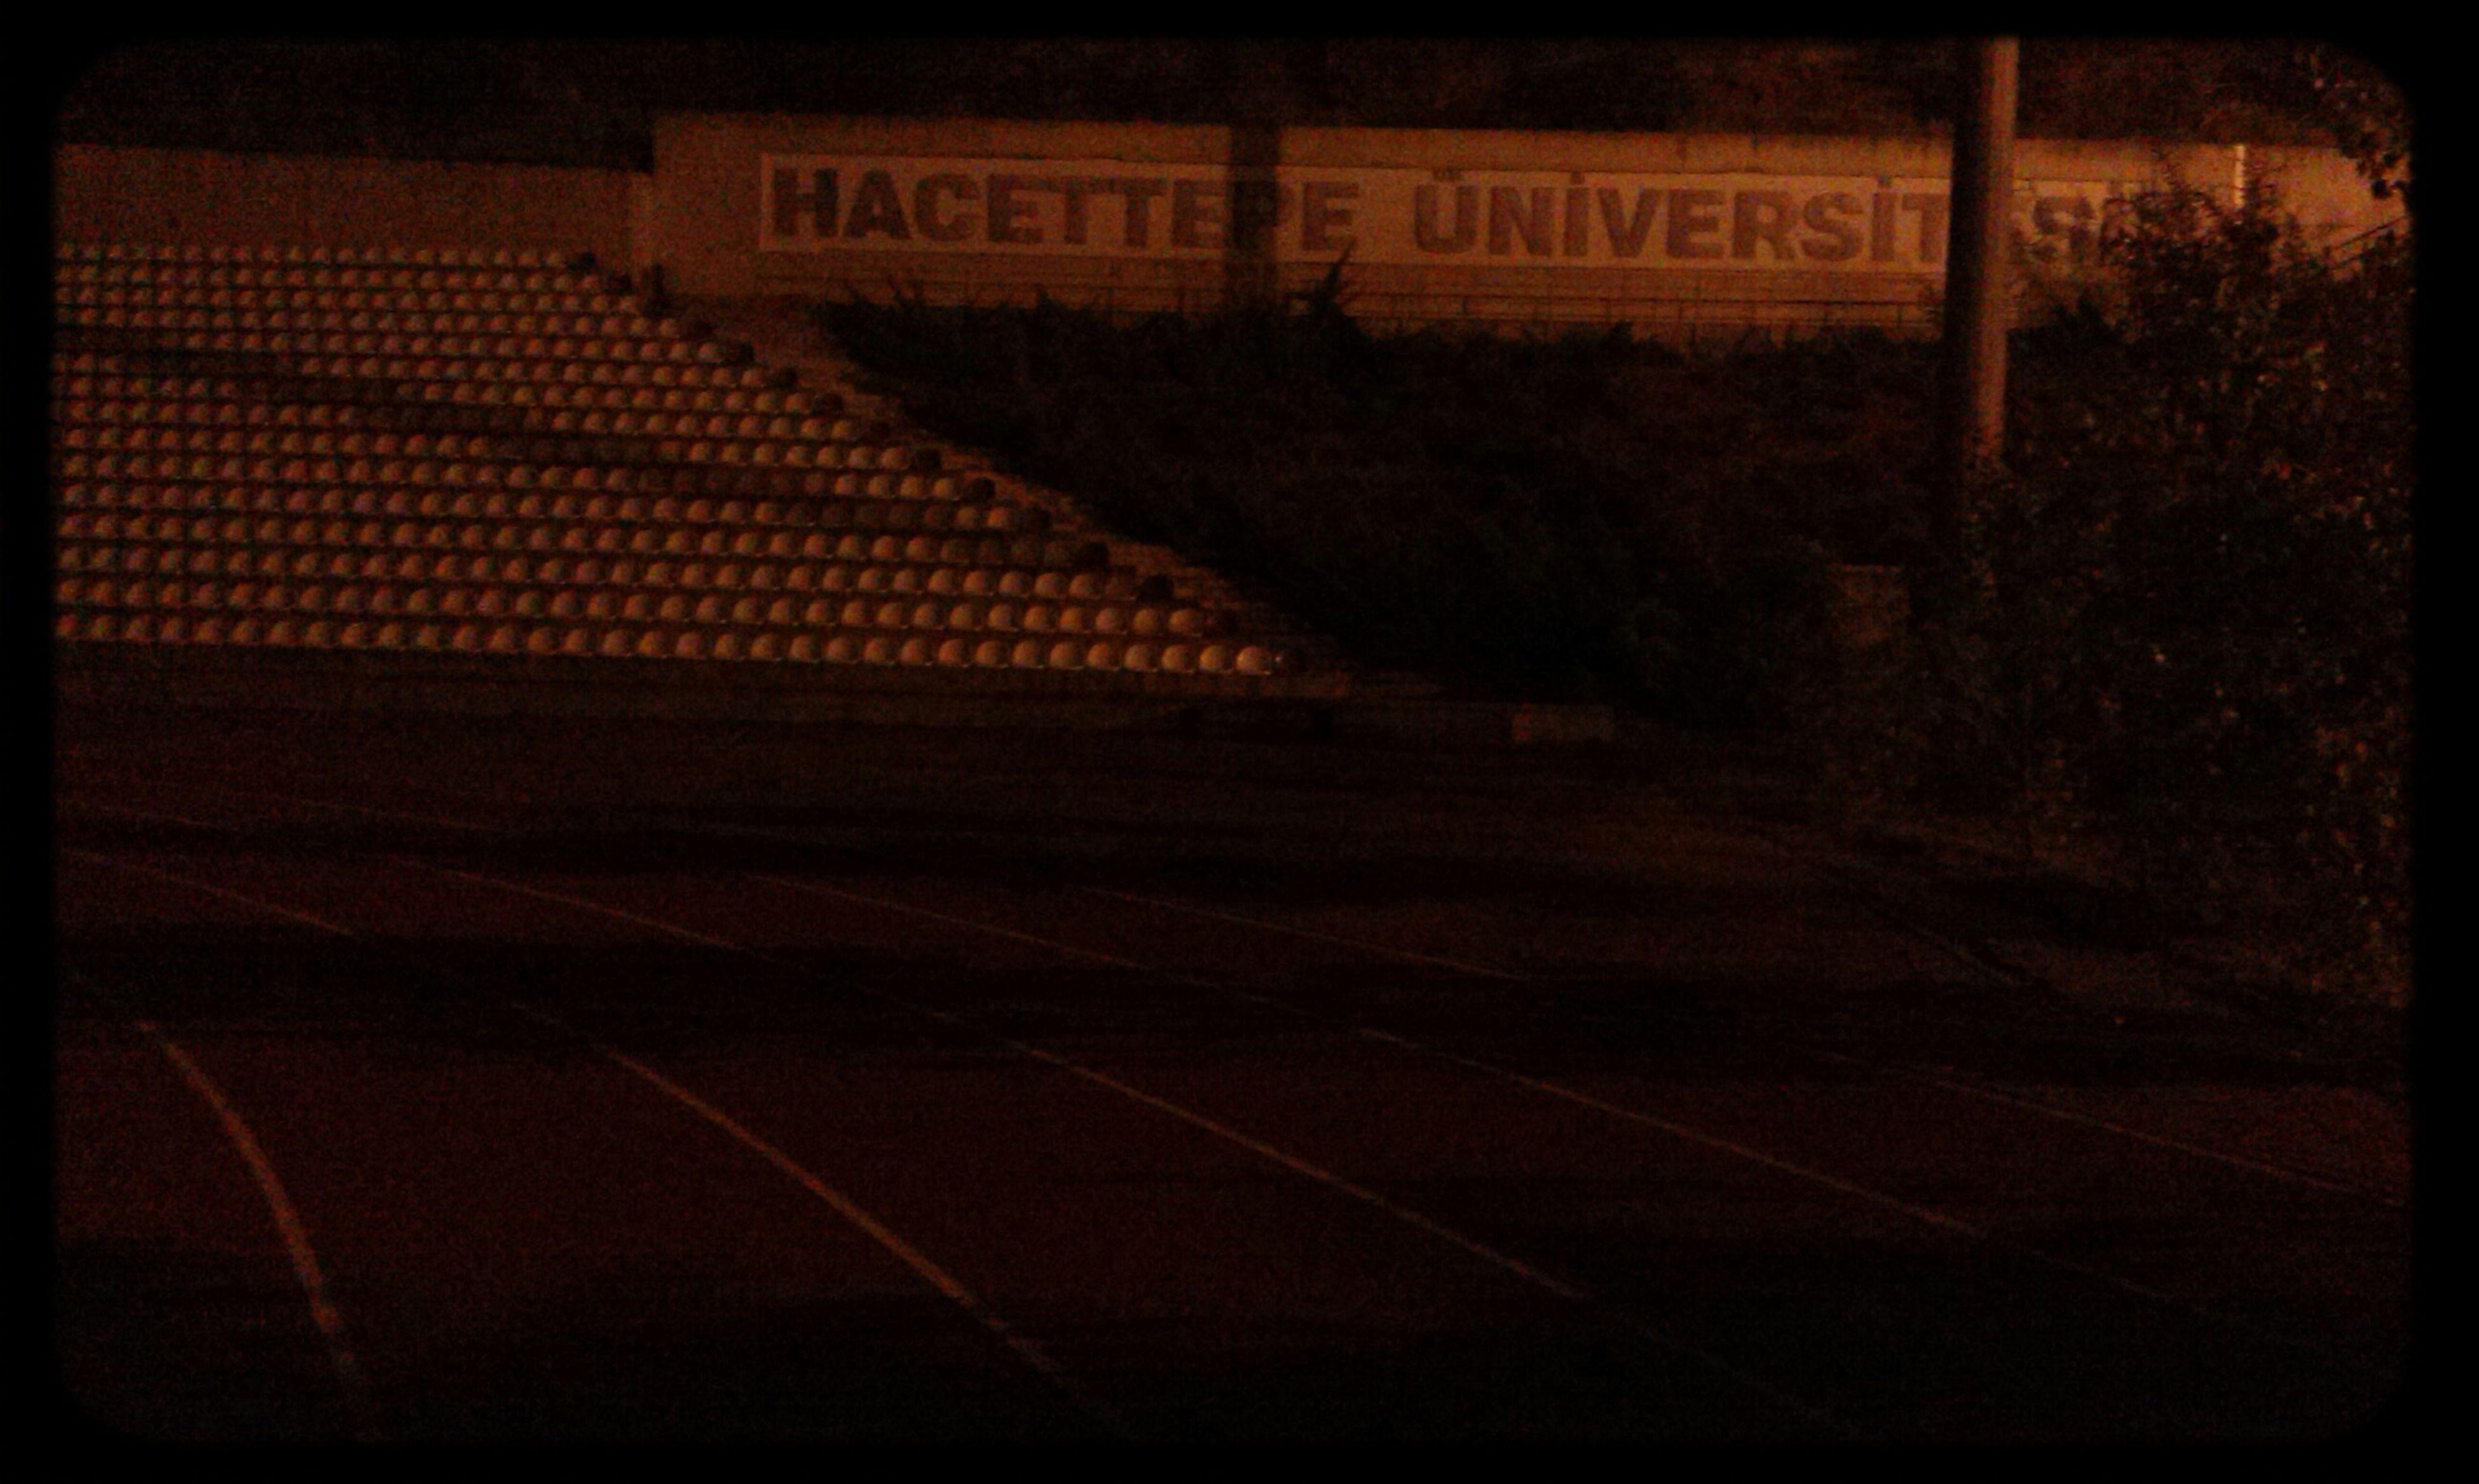 Hacettepe University Justdoıt Escaping Everyday Lives